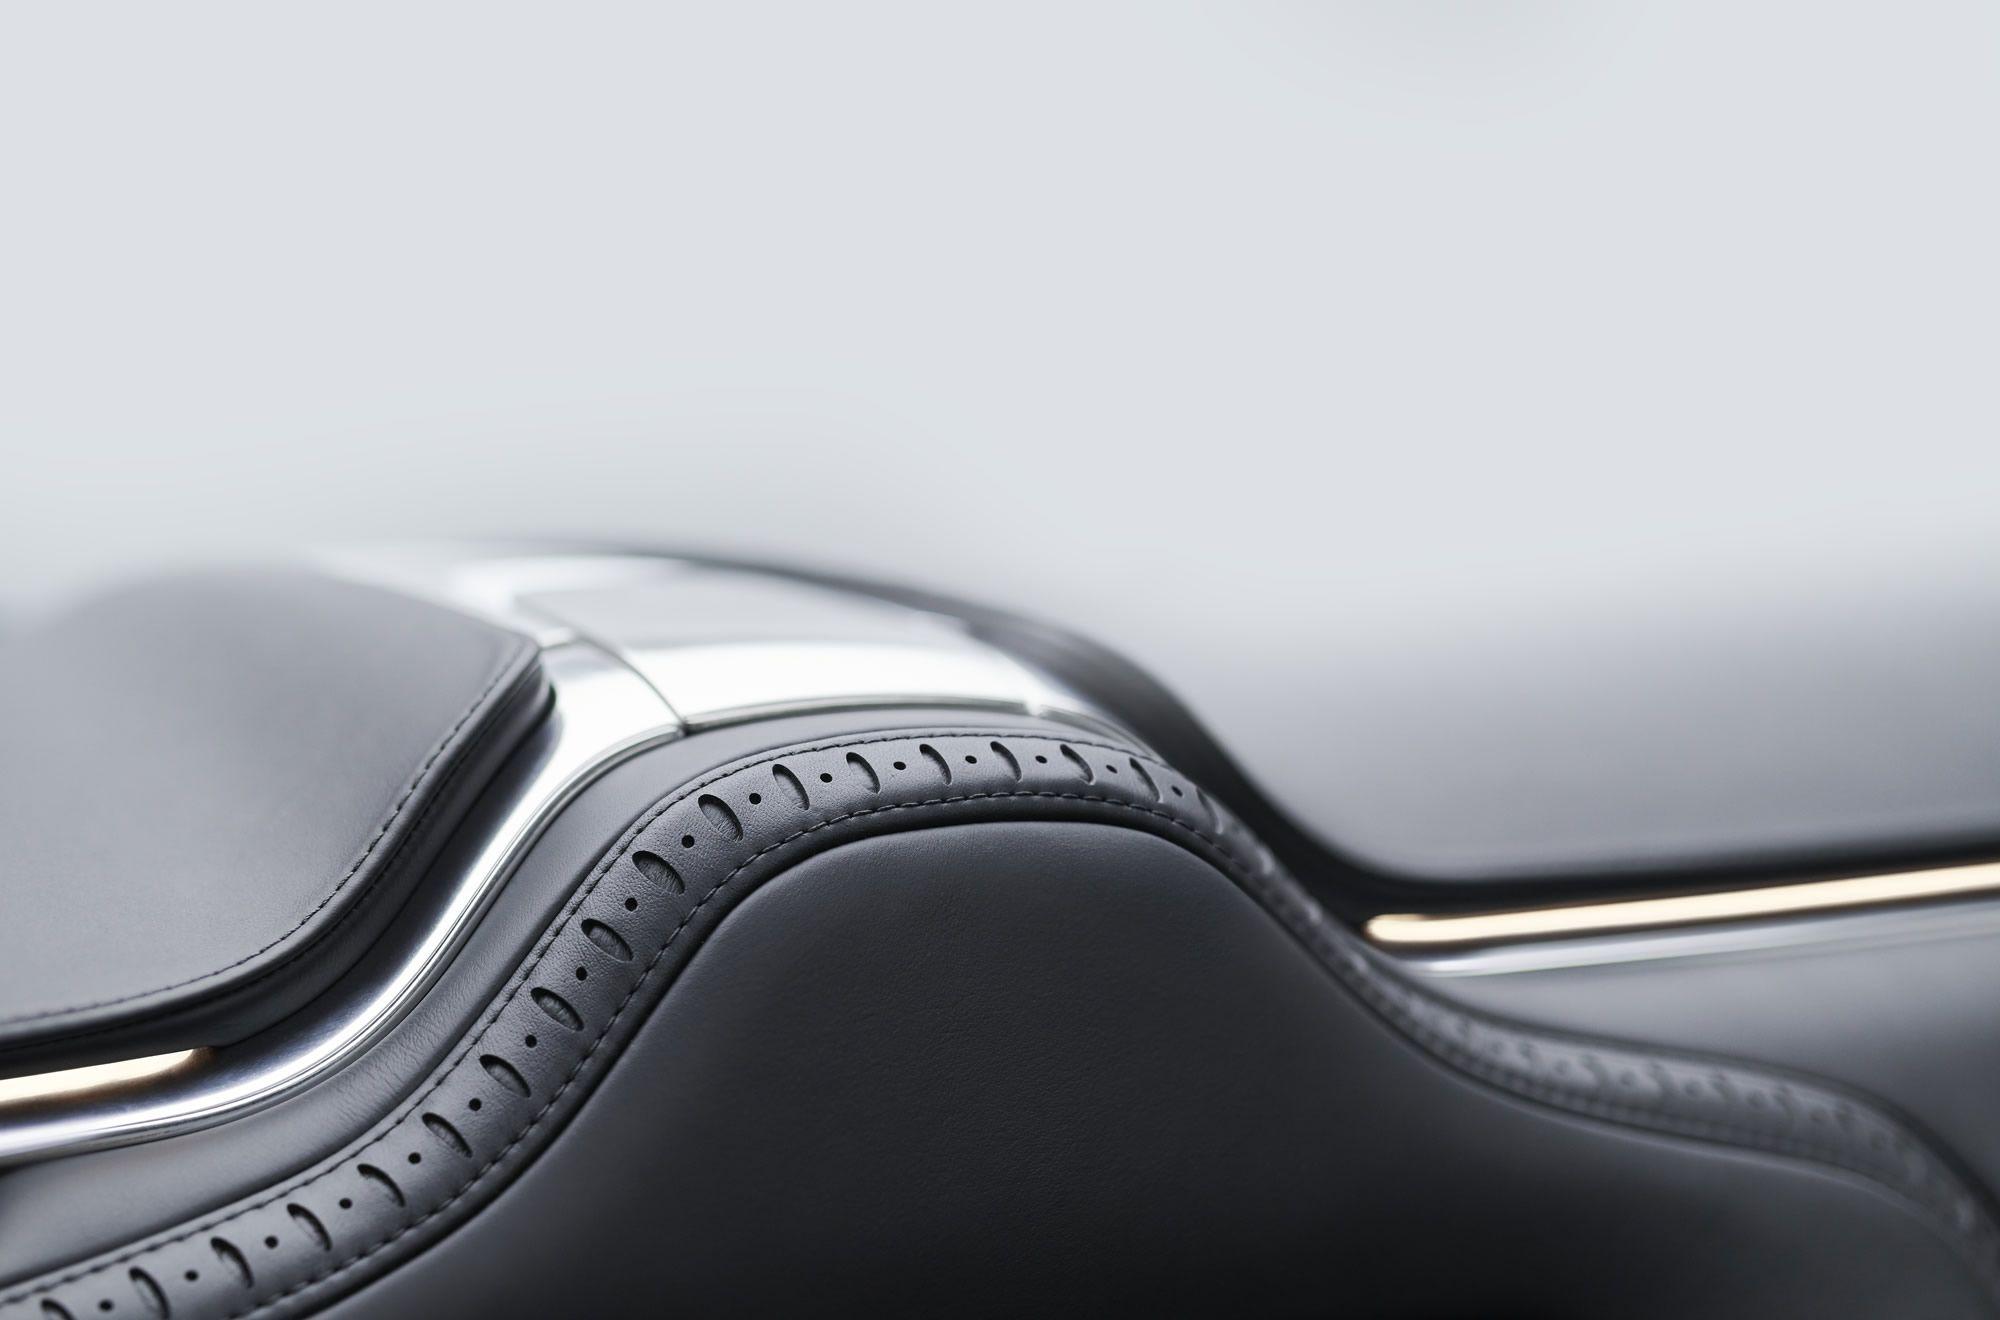 Polestar 1 by volvo a new electric performance hybrid